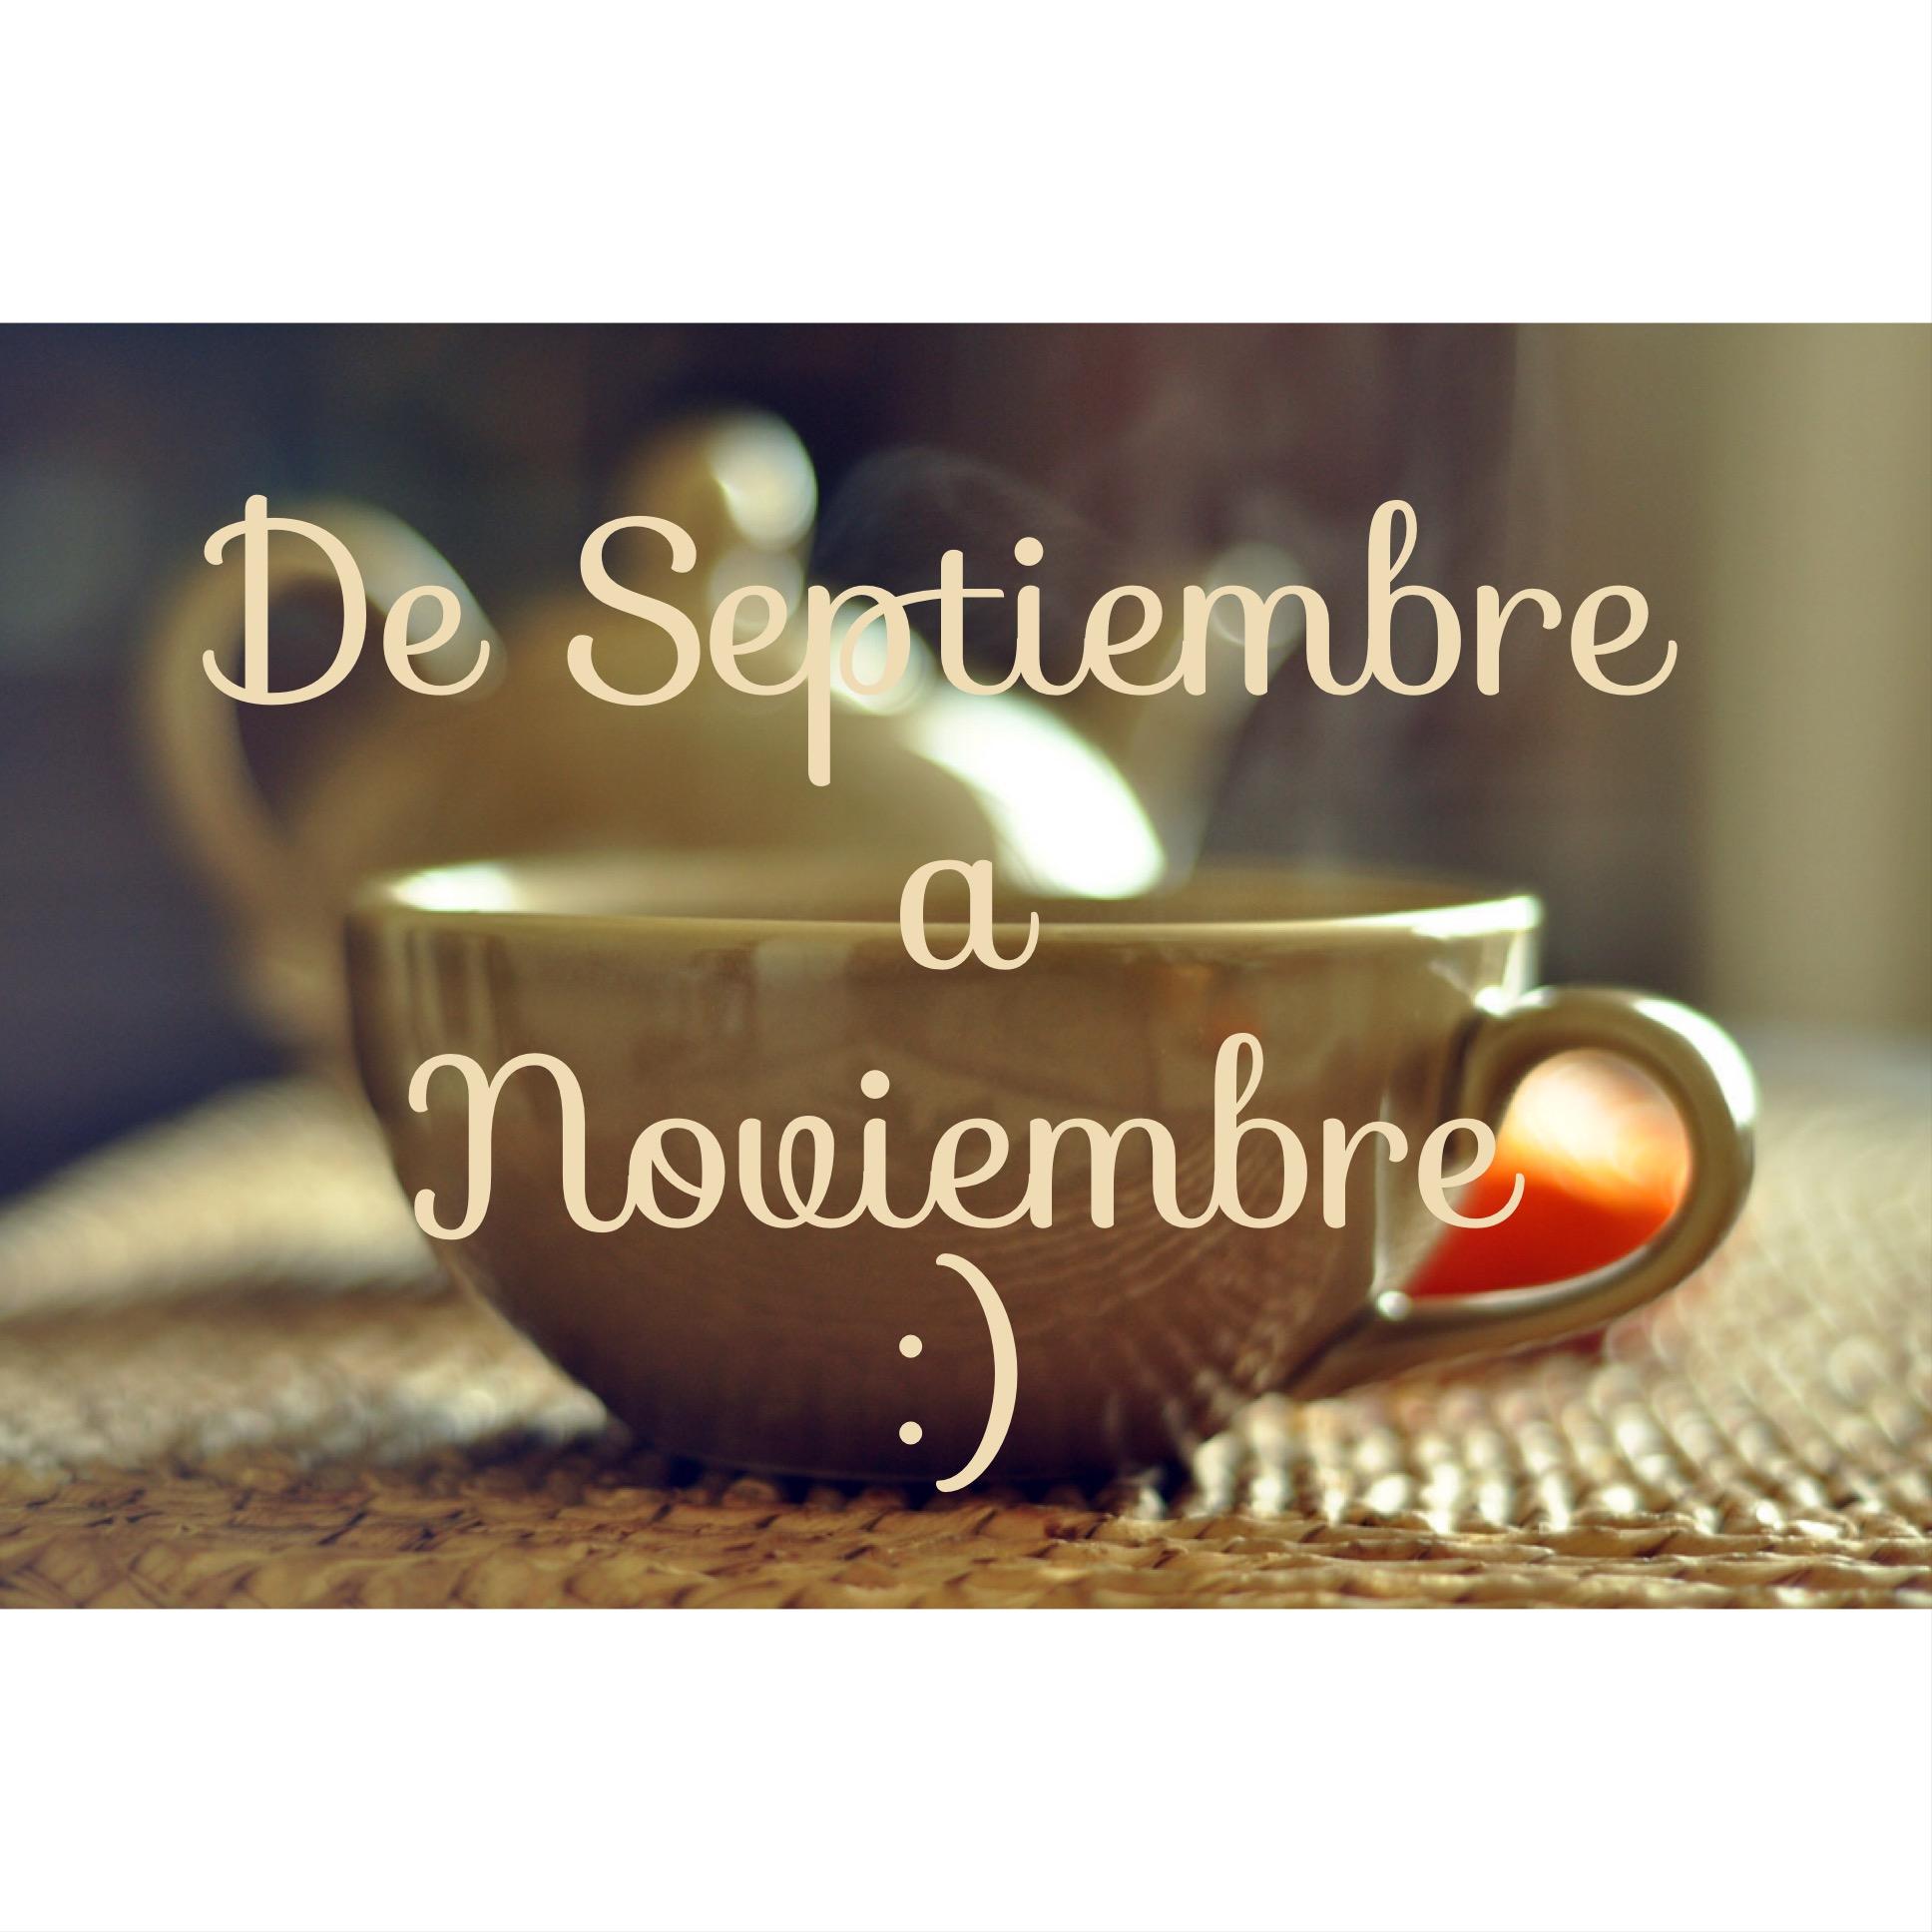 De Septiembre a Noviembre